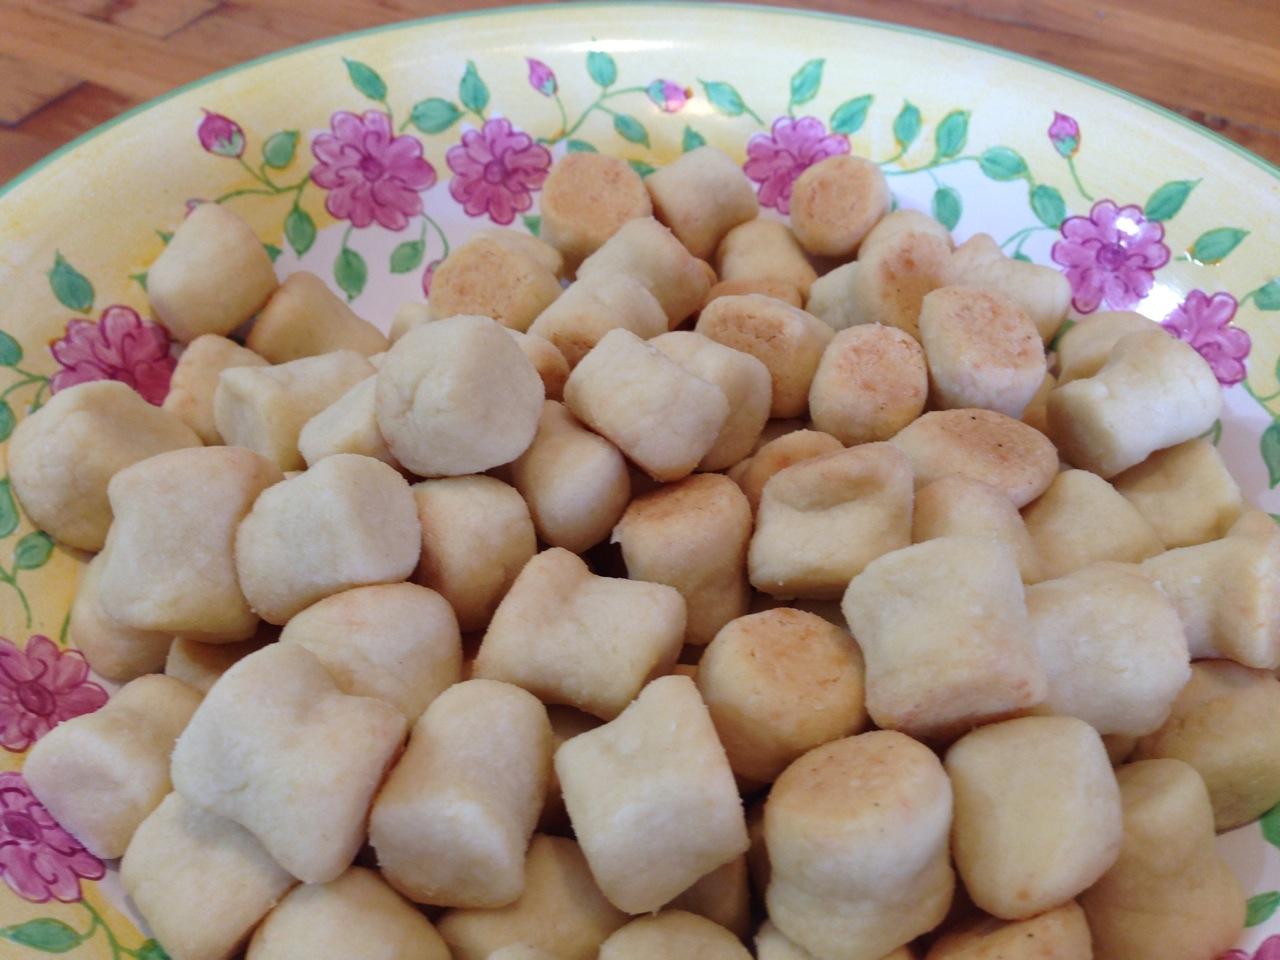 Tubinhos-de-queijo2